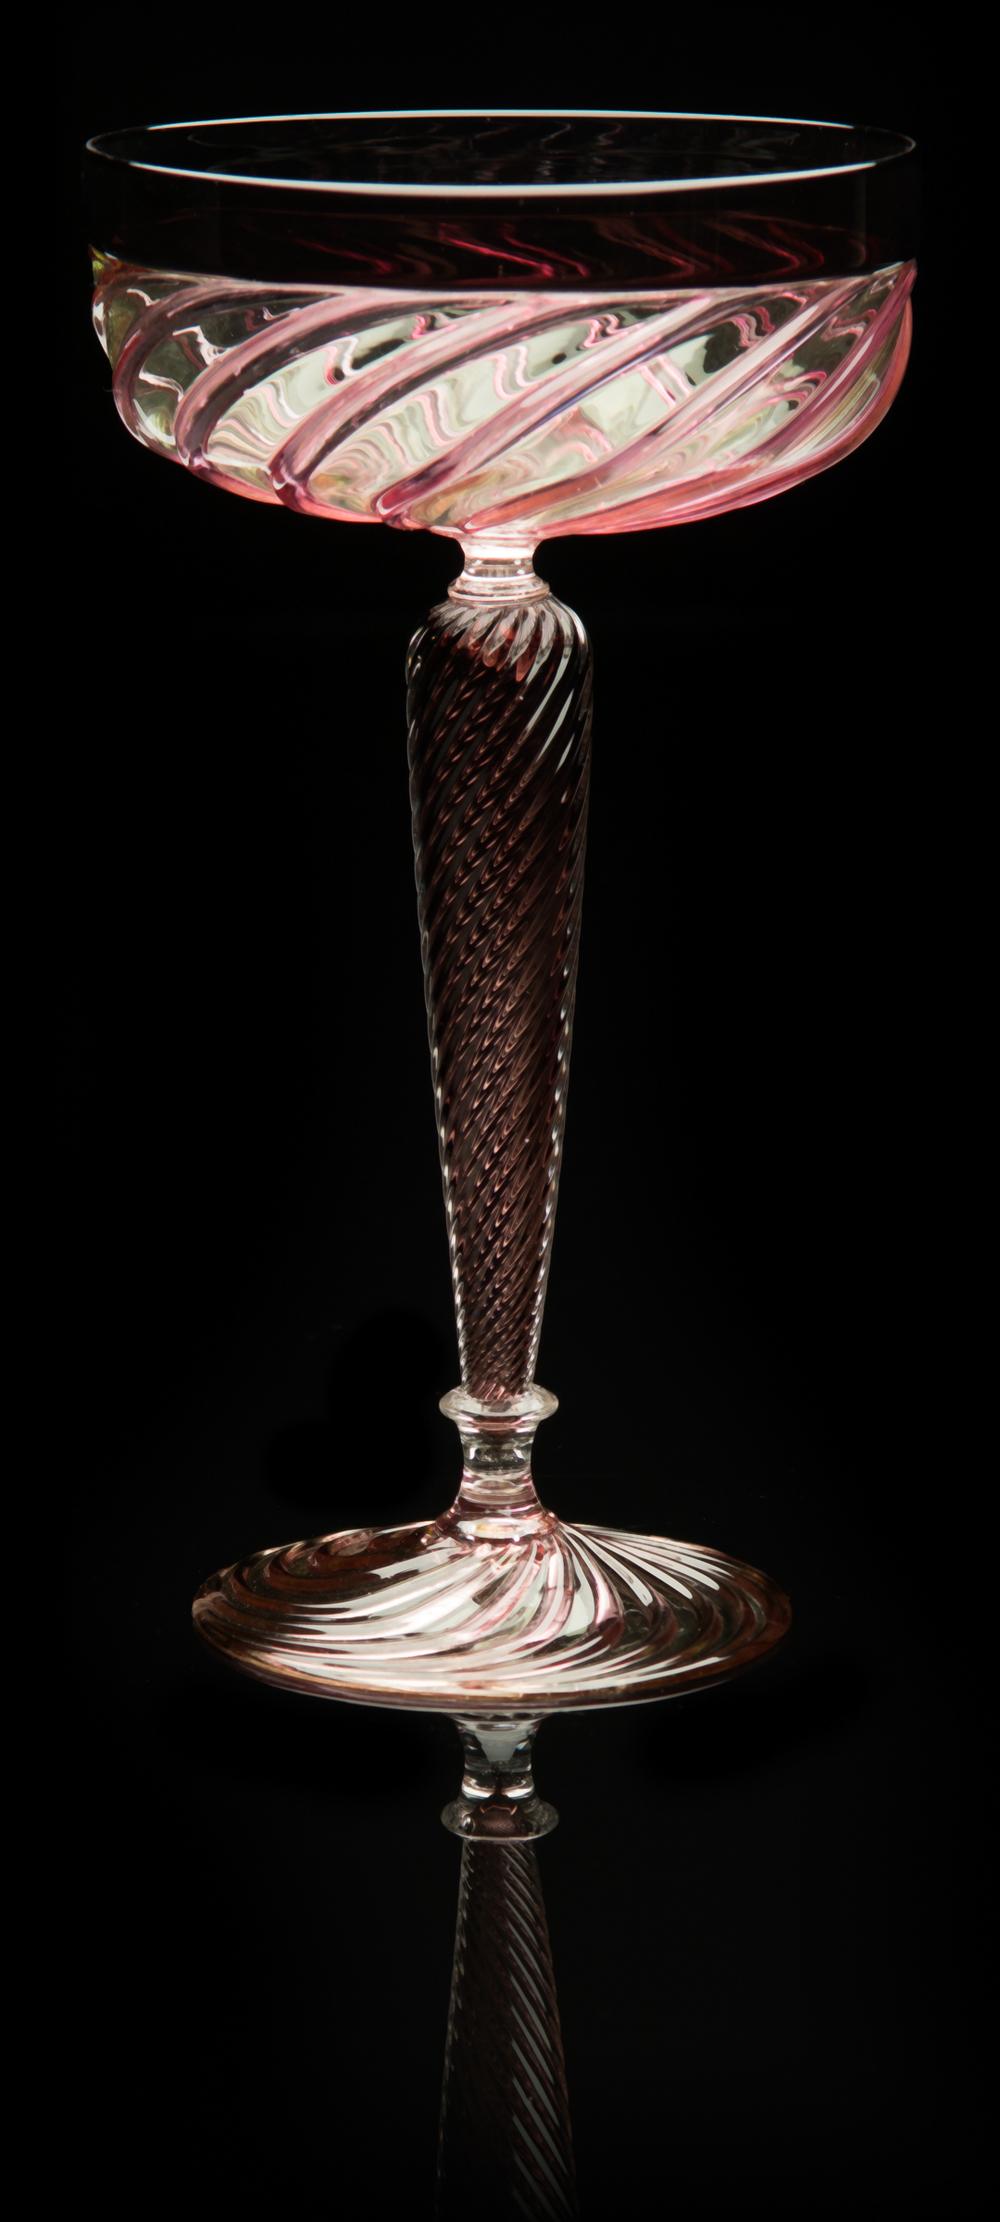 Lino Tagliapietra, Goblet, (1991-1994, glass, 8 9/16 x 4 13/16 x 4 13/16 inches), LT.40